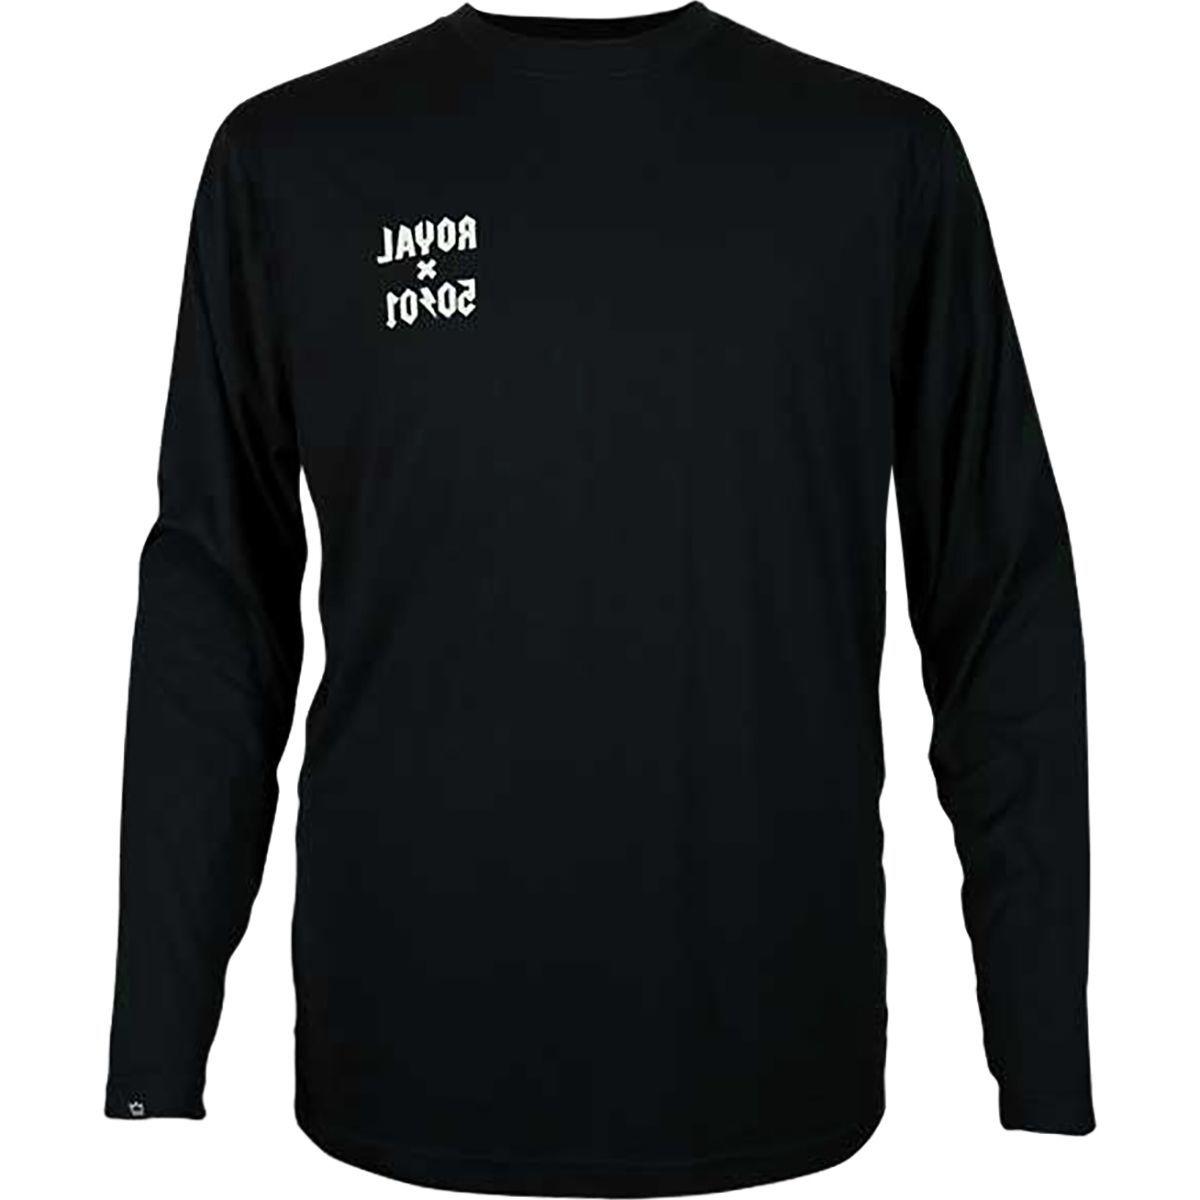 Royal Racing Core Long-Sleeve Jersey - Men's